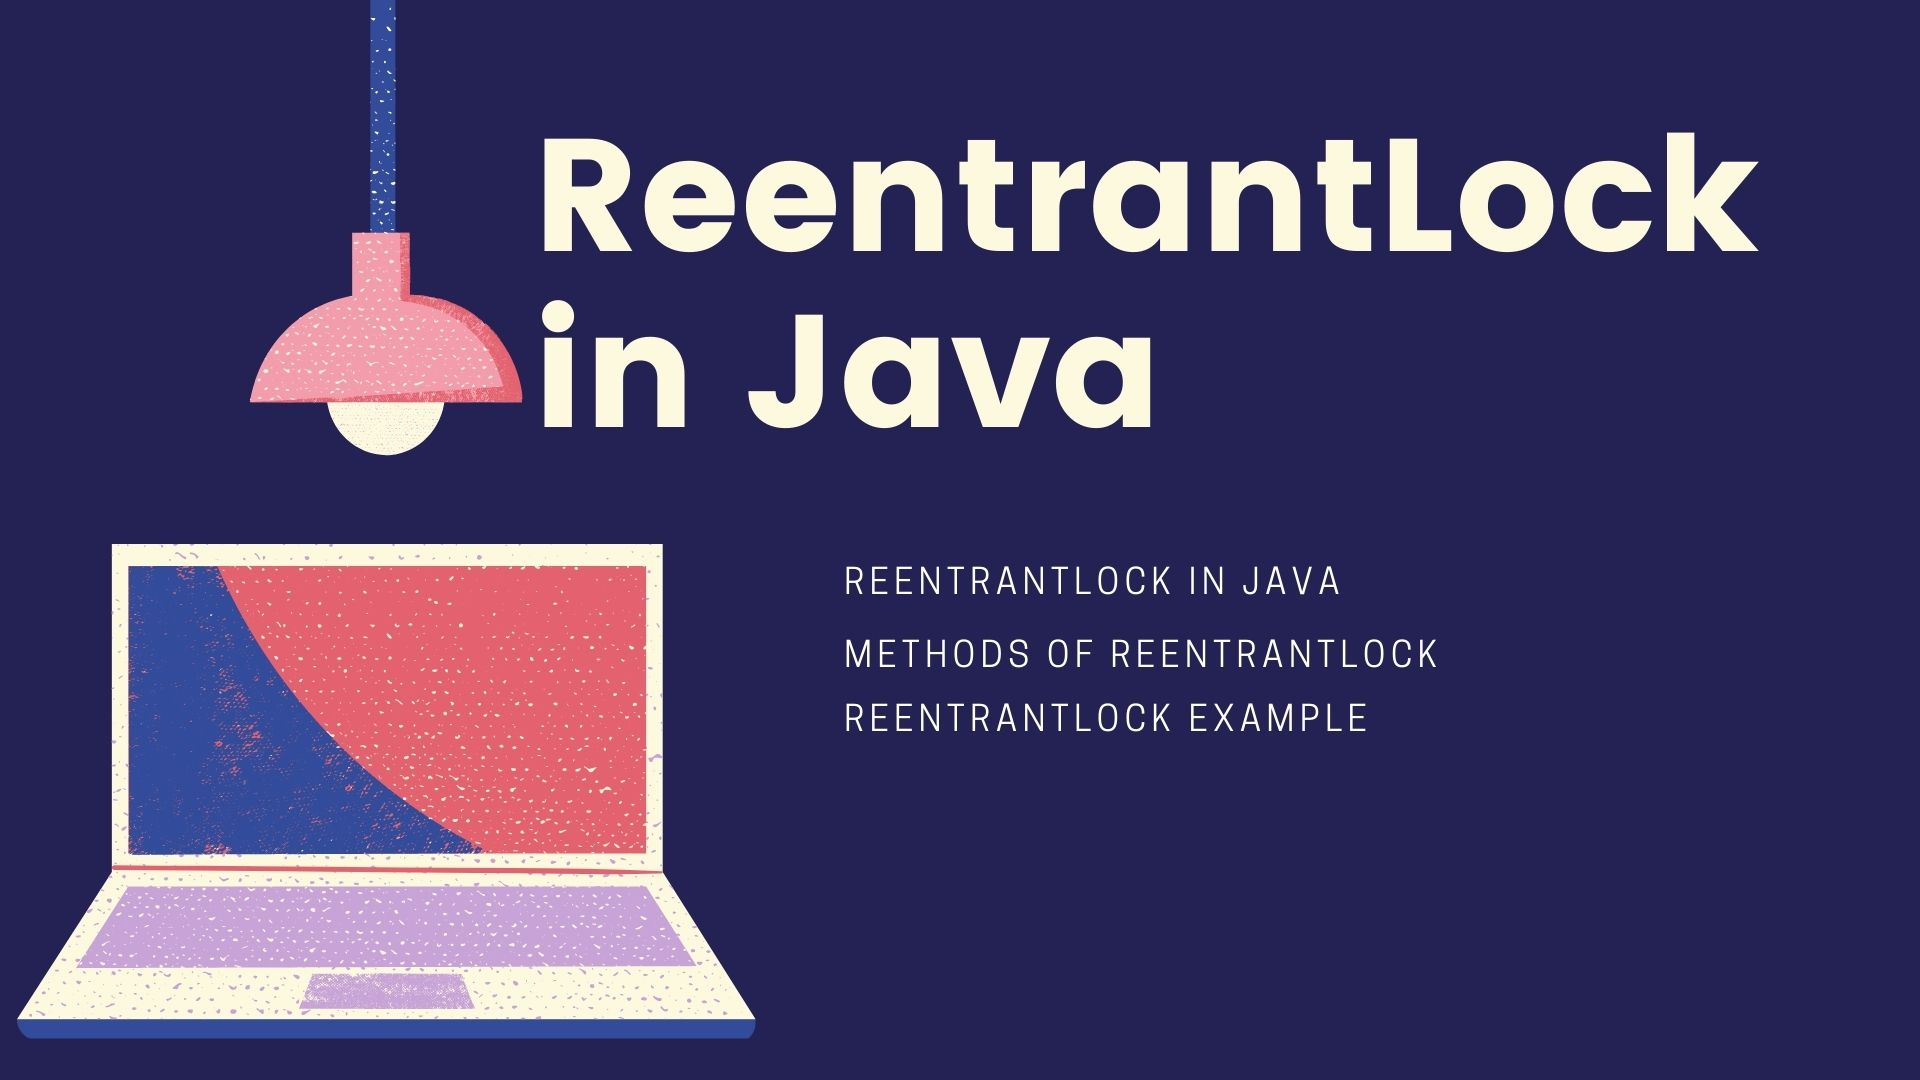 ReentrantLock in Java